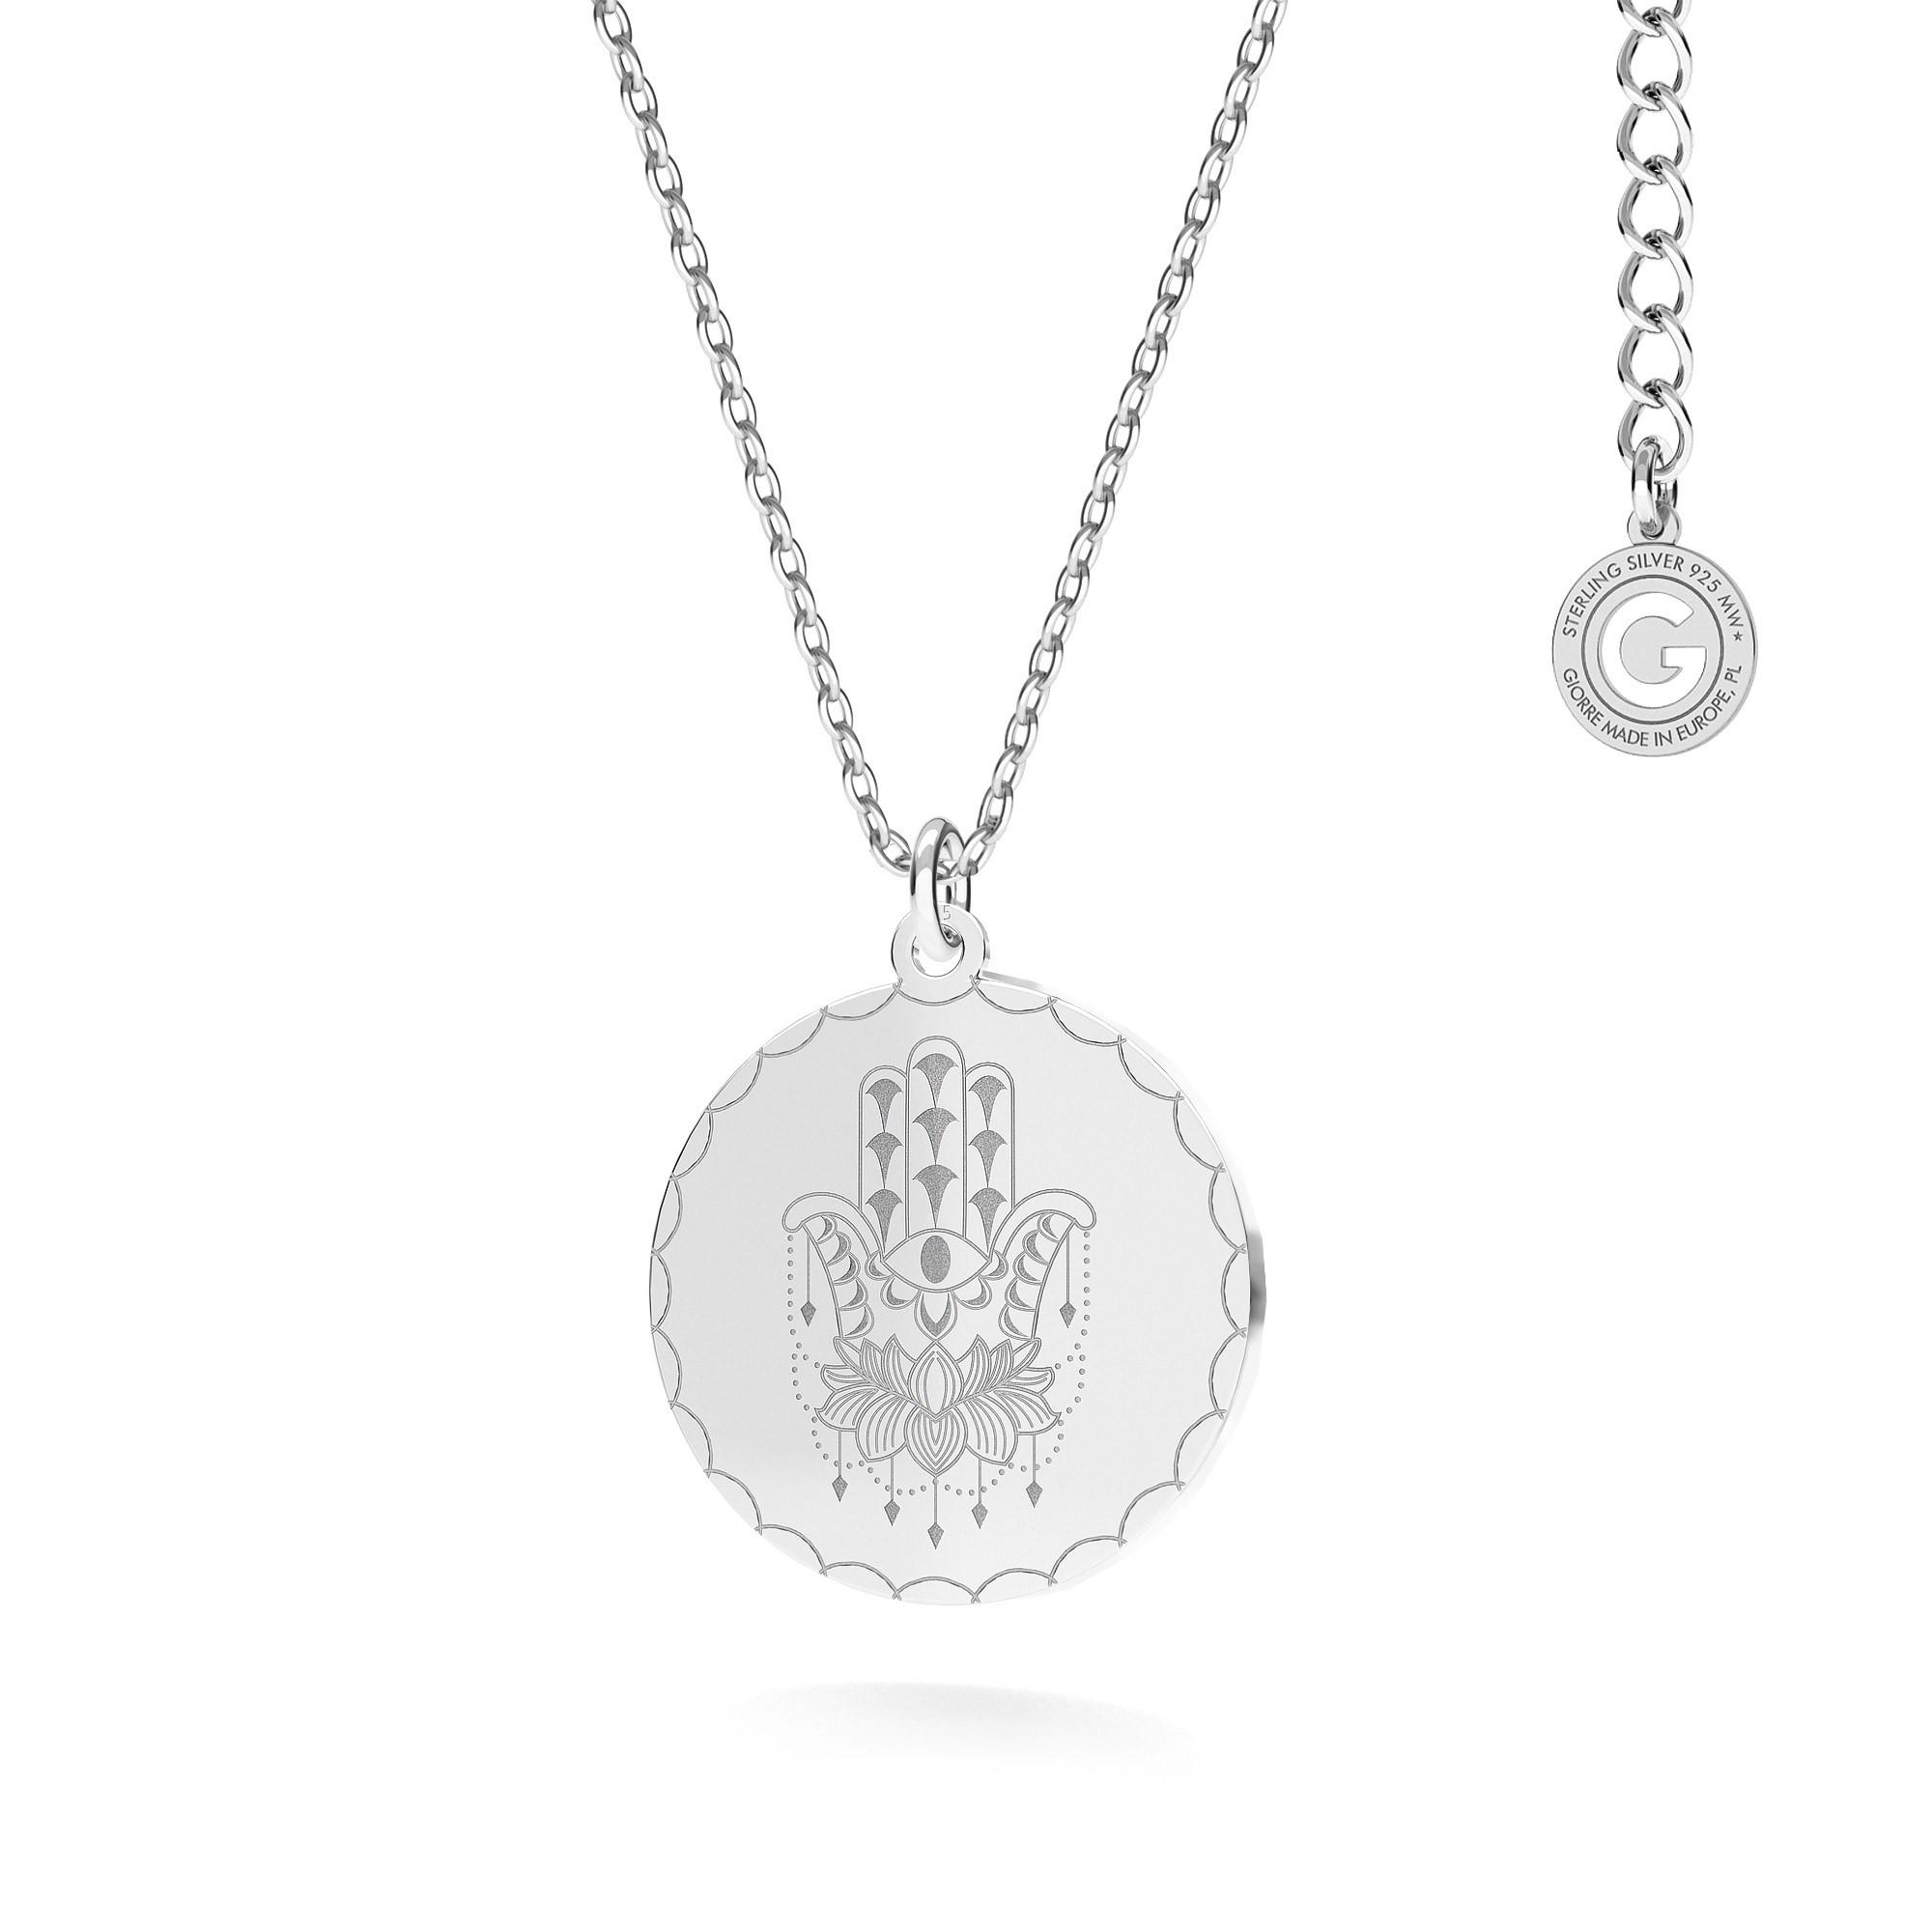 MON DÉFI Necklace - coral, sterling silver 925